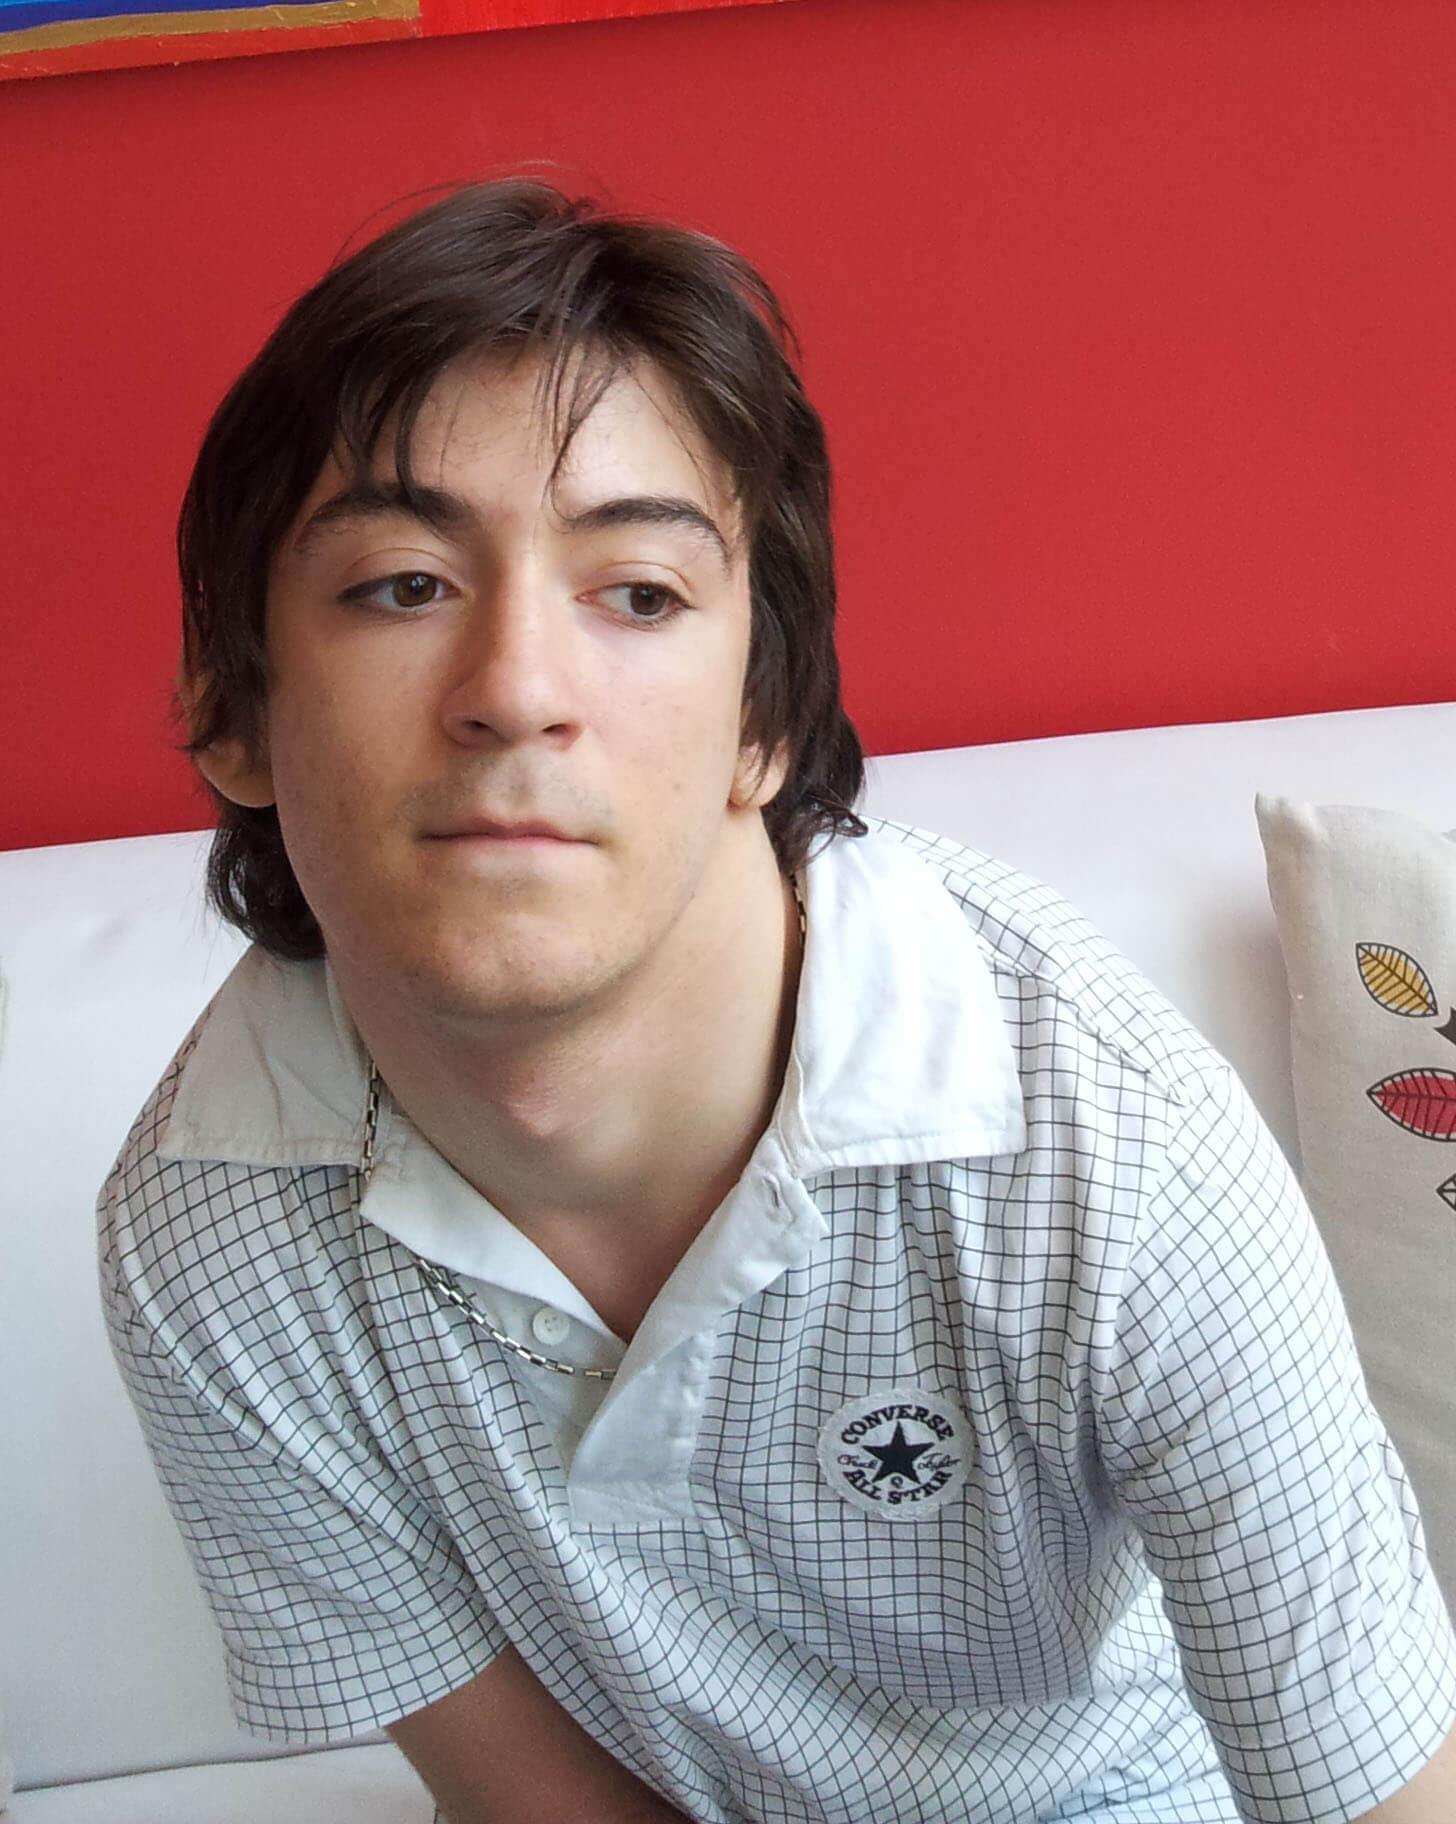 Петър Нефтелимов, блог, блогър, neftelimov.com